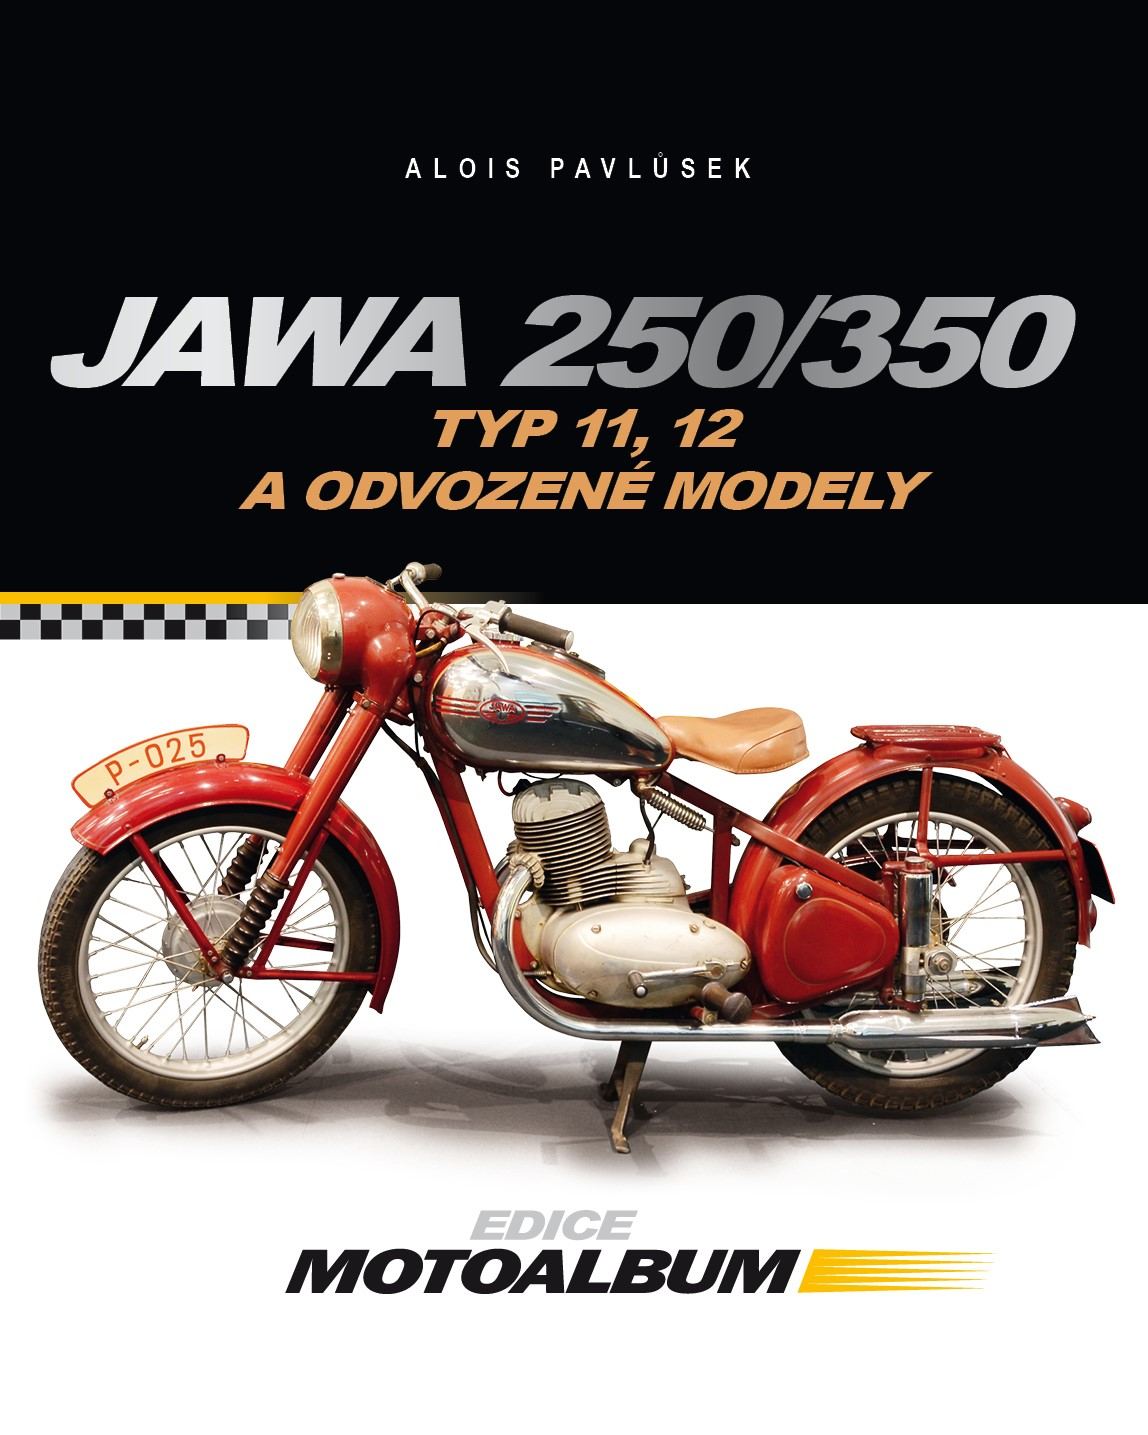 Jawa 250 / 350 | Alois Pavlůsek